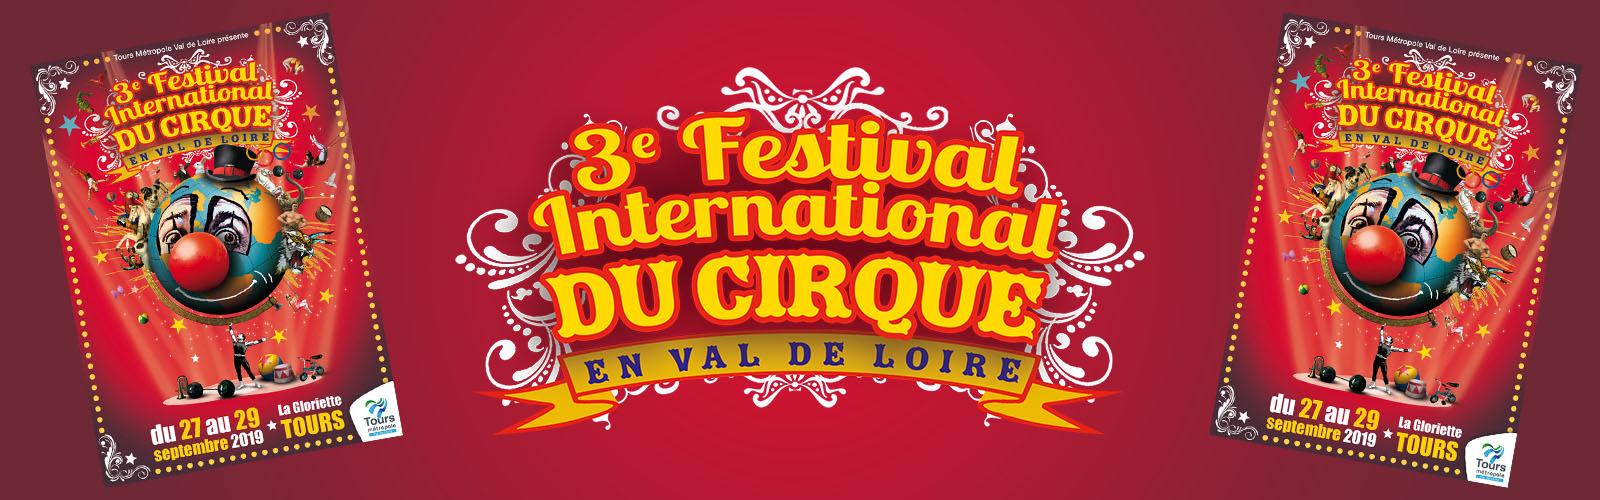 https://www.festival-cirquetours.fr/